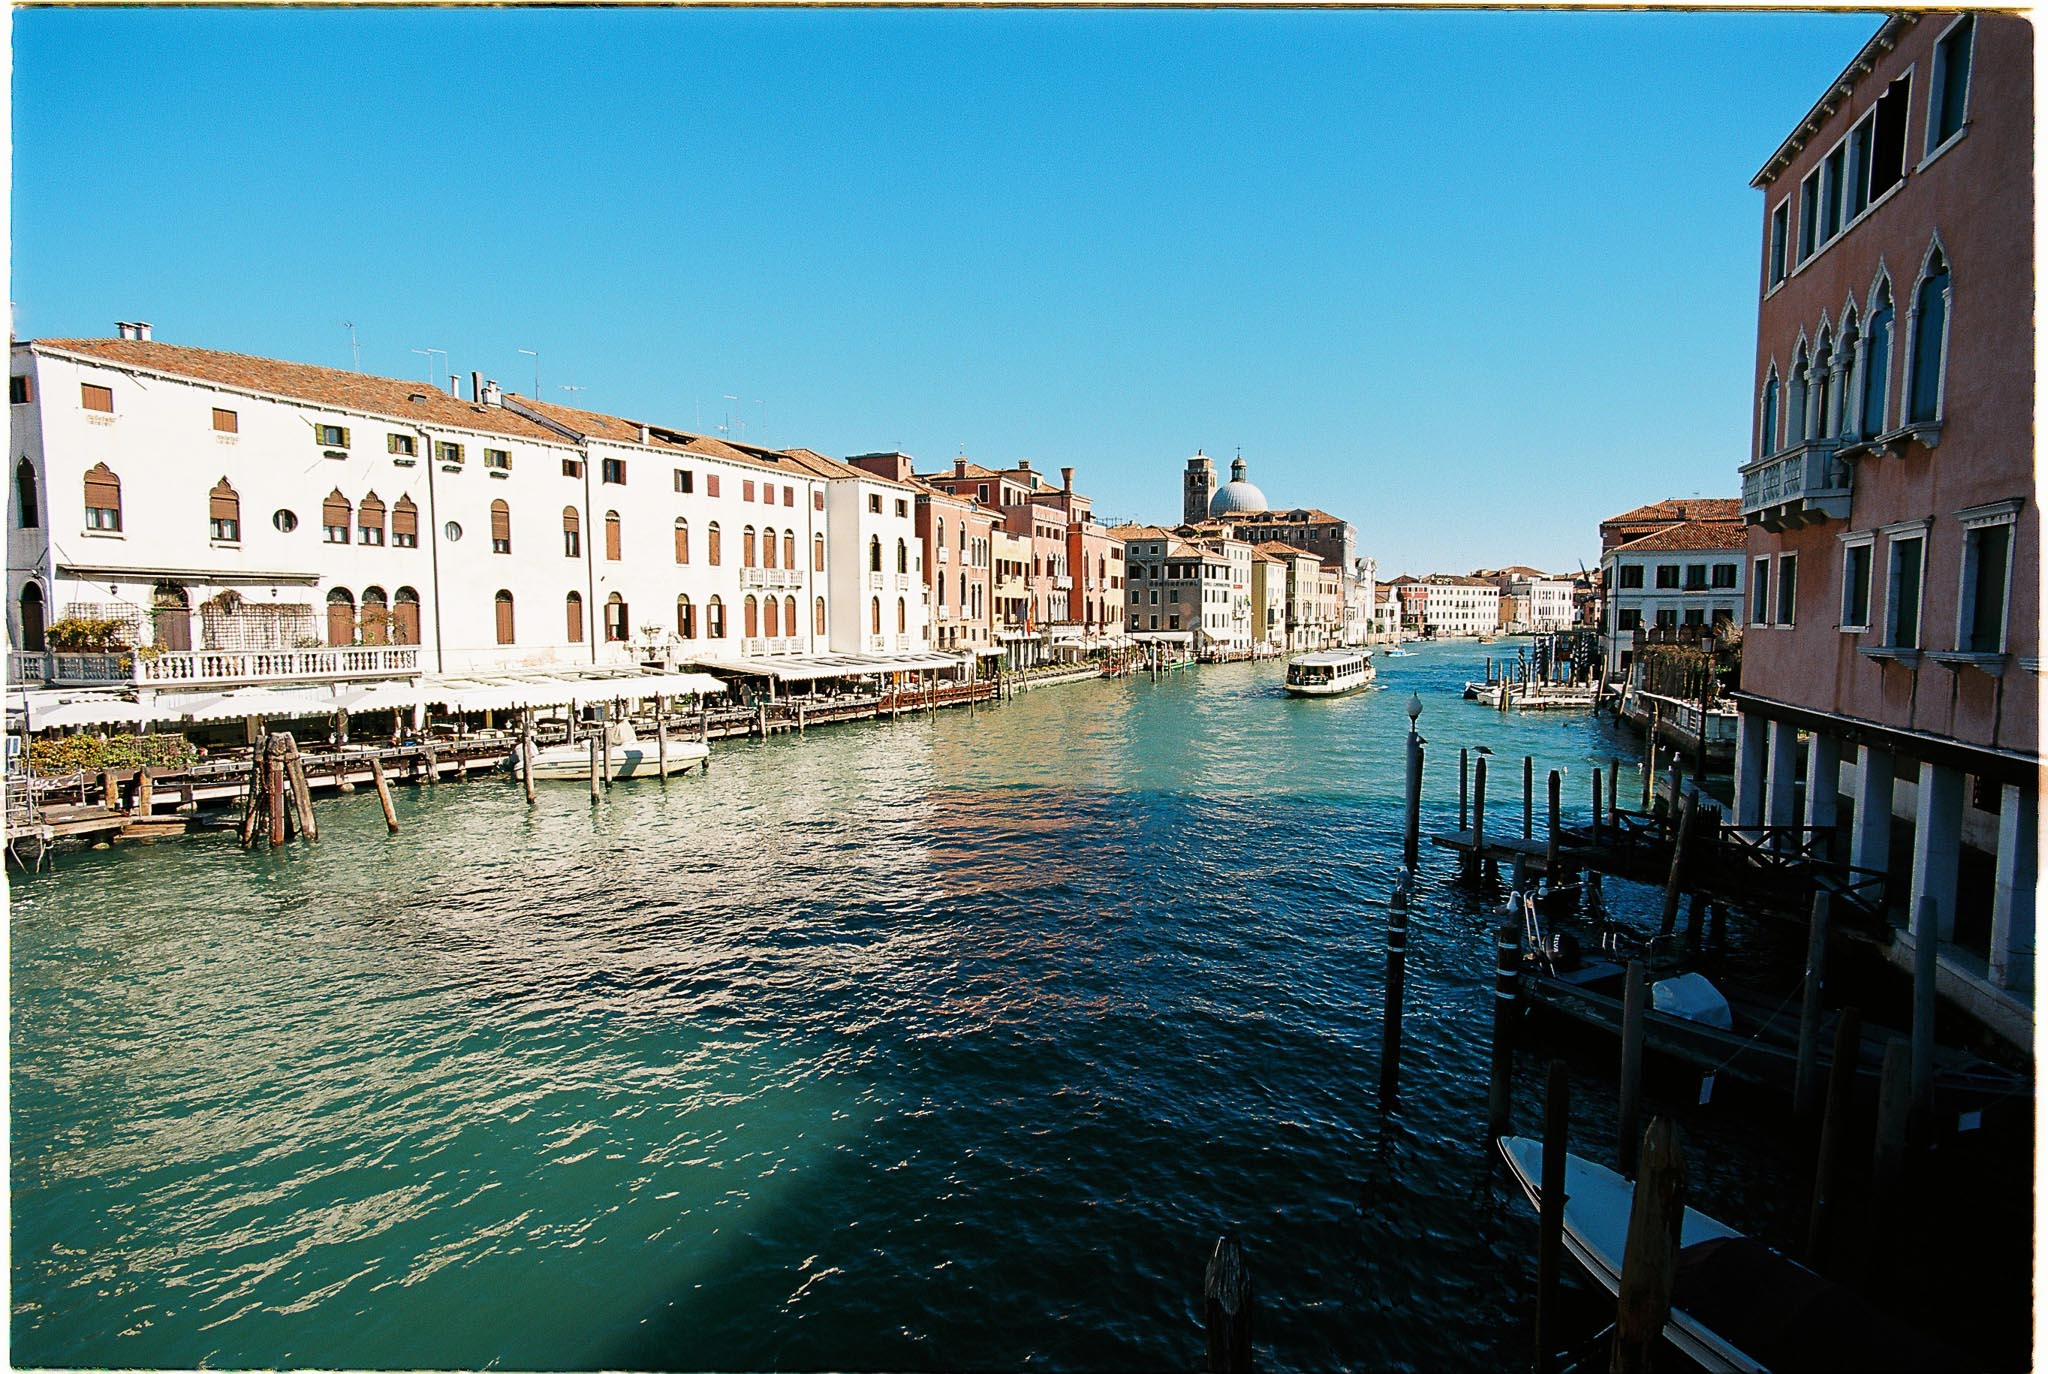 Venice Grad canal Kodak Ektar 100 Zeiss distagon 18mm F3.5